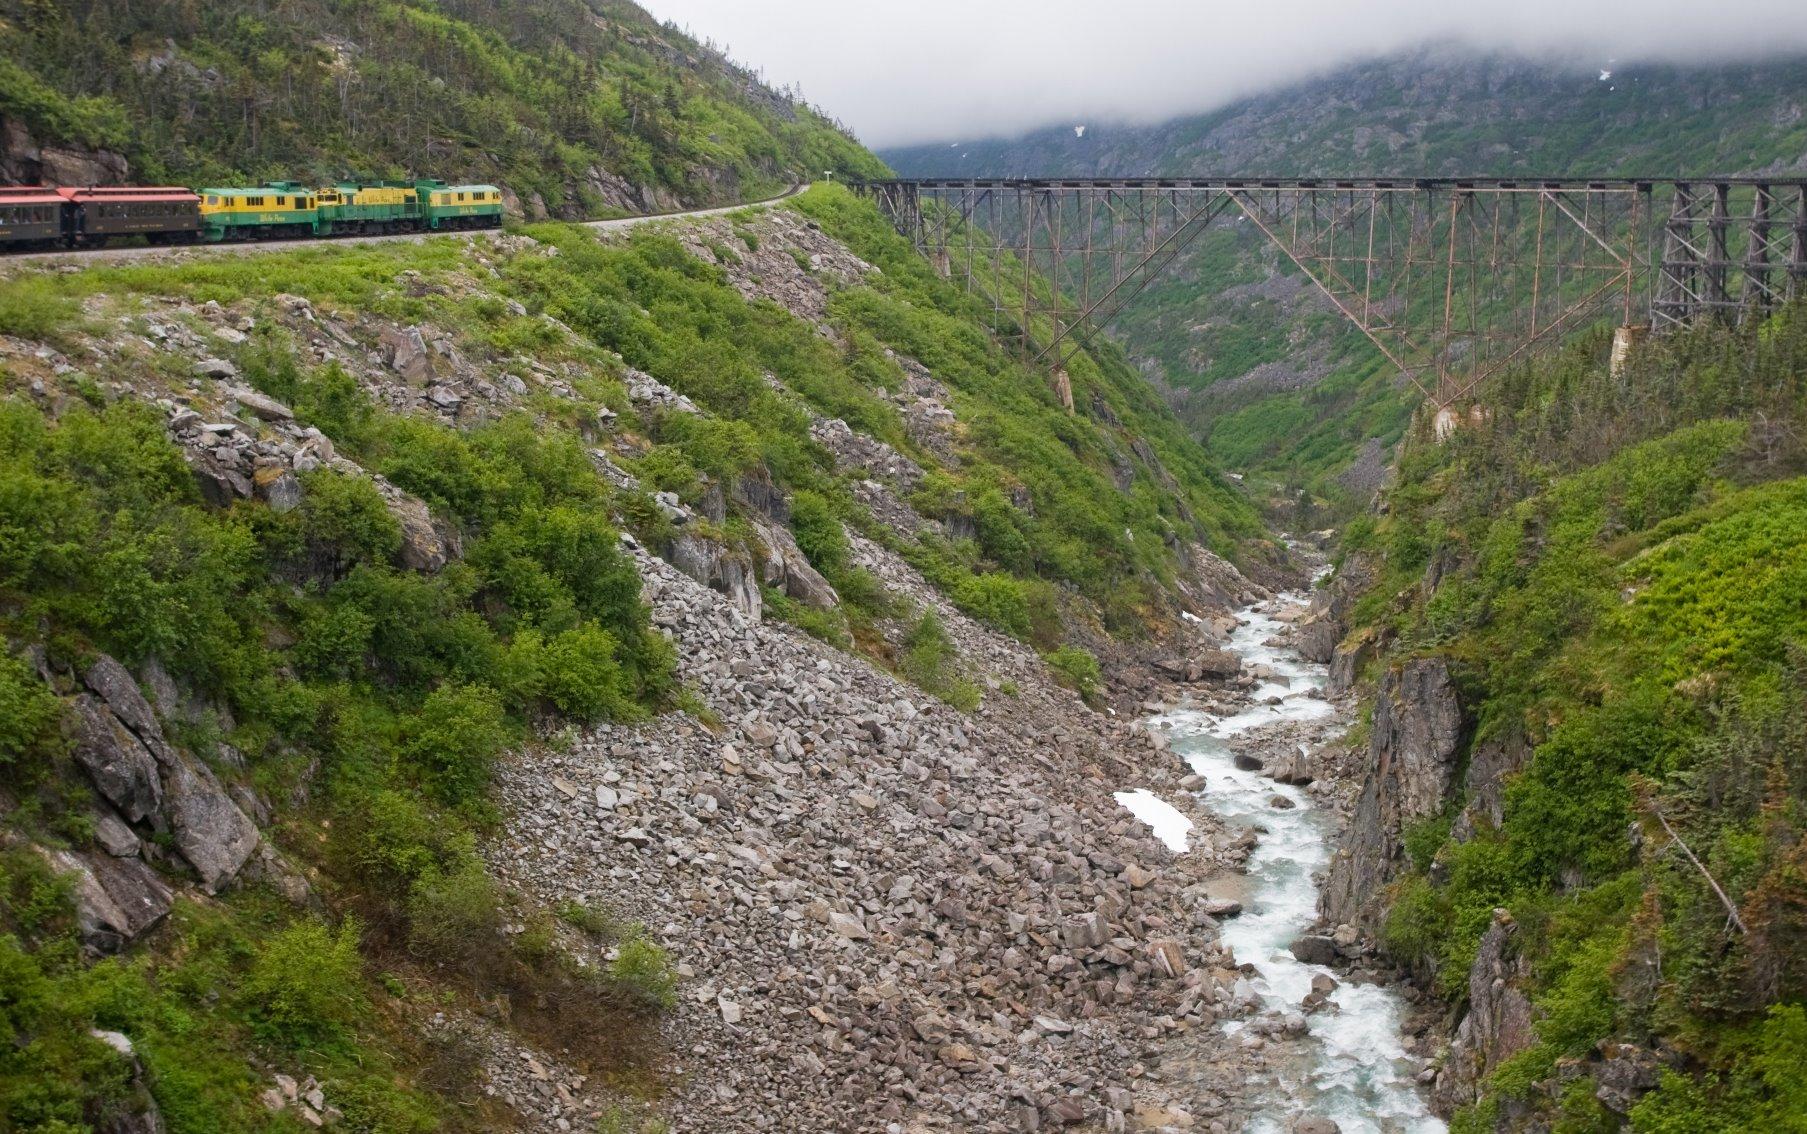 Summit of the train ride to the Yukon Territory.